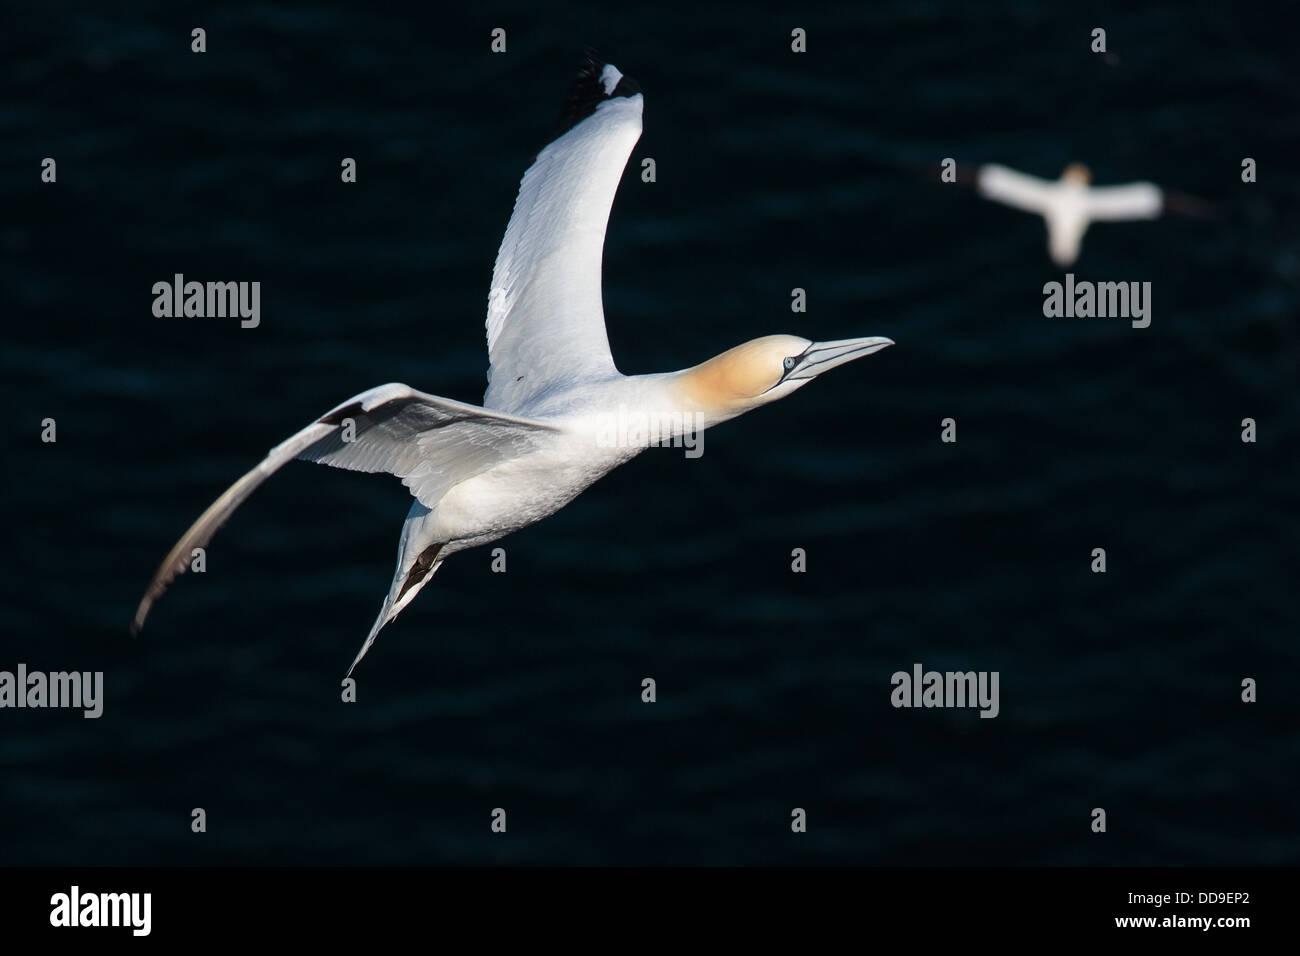 Northern Gannet, Morus bassanus, in flight - Stock Image